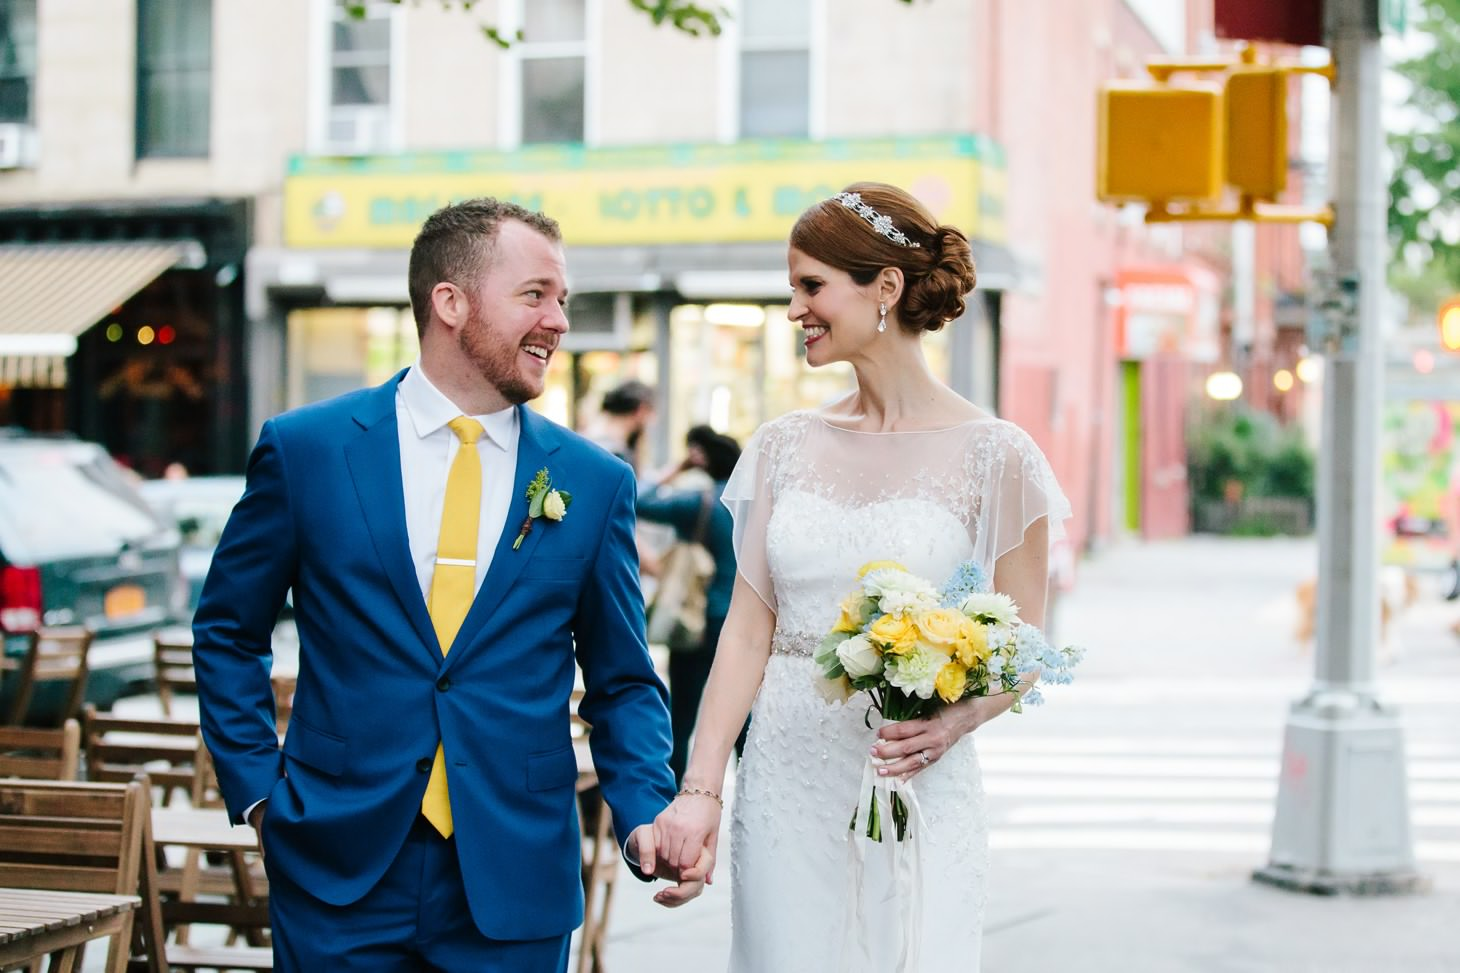 brooklyn-restaurant-wedding-nyc-weddingi-photographer-smitten-chickens20.jpg